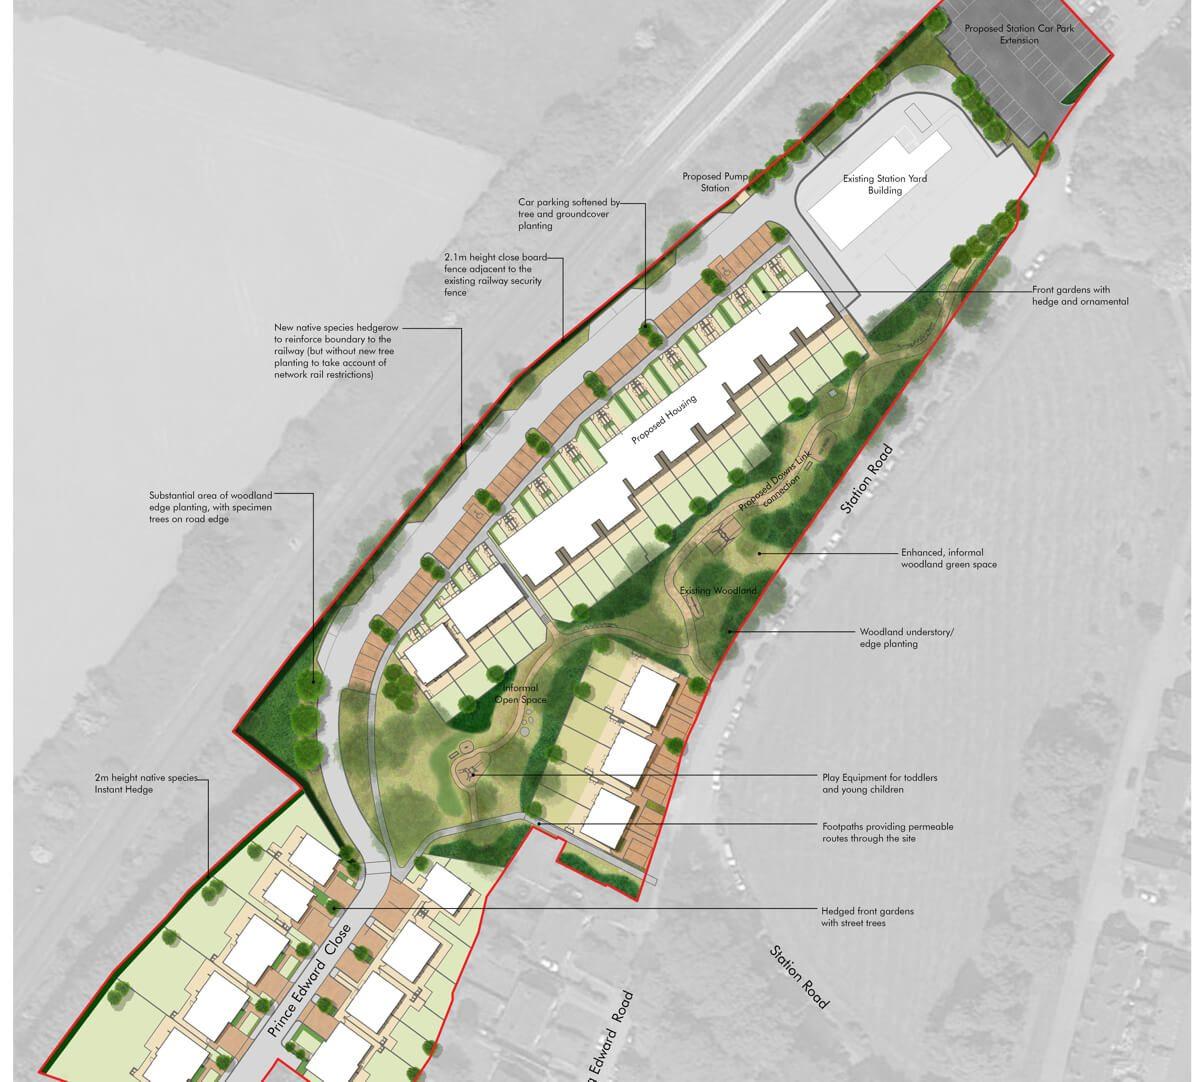 Christs Hospital Residential Masterplan